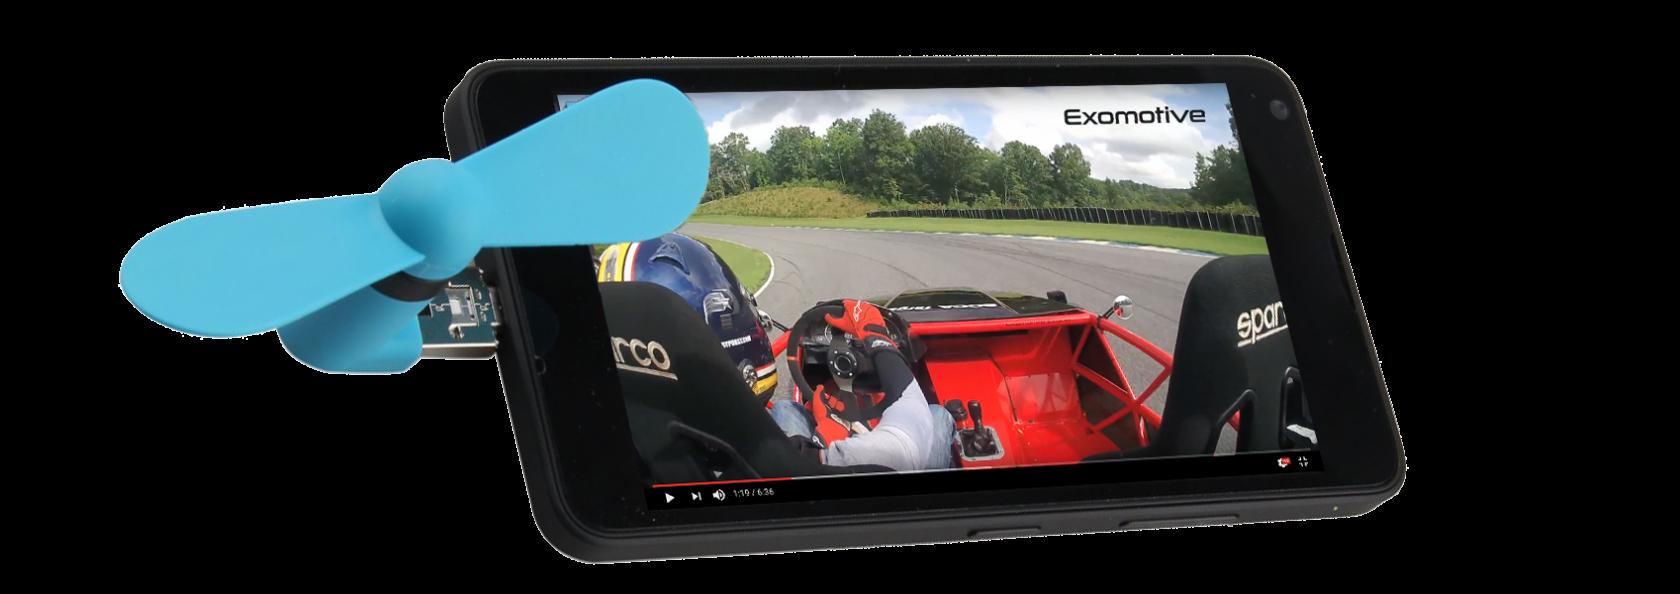 Exomotive-Exocet-Fan-Virtual-Test-Drive